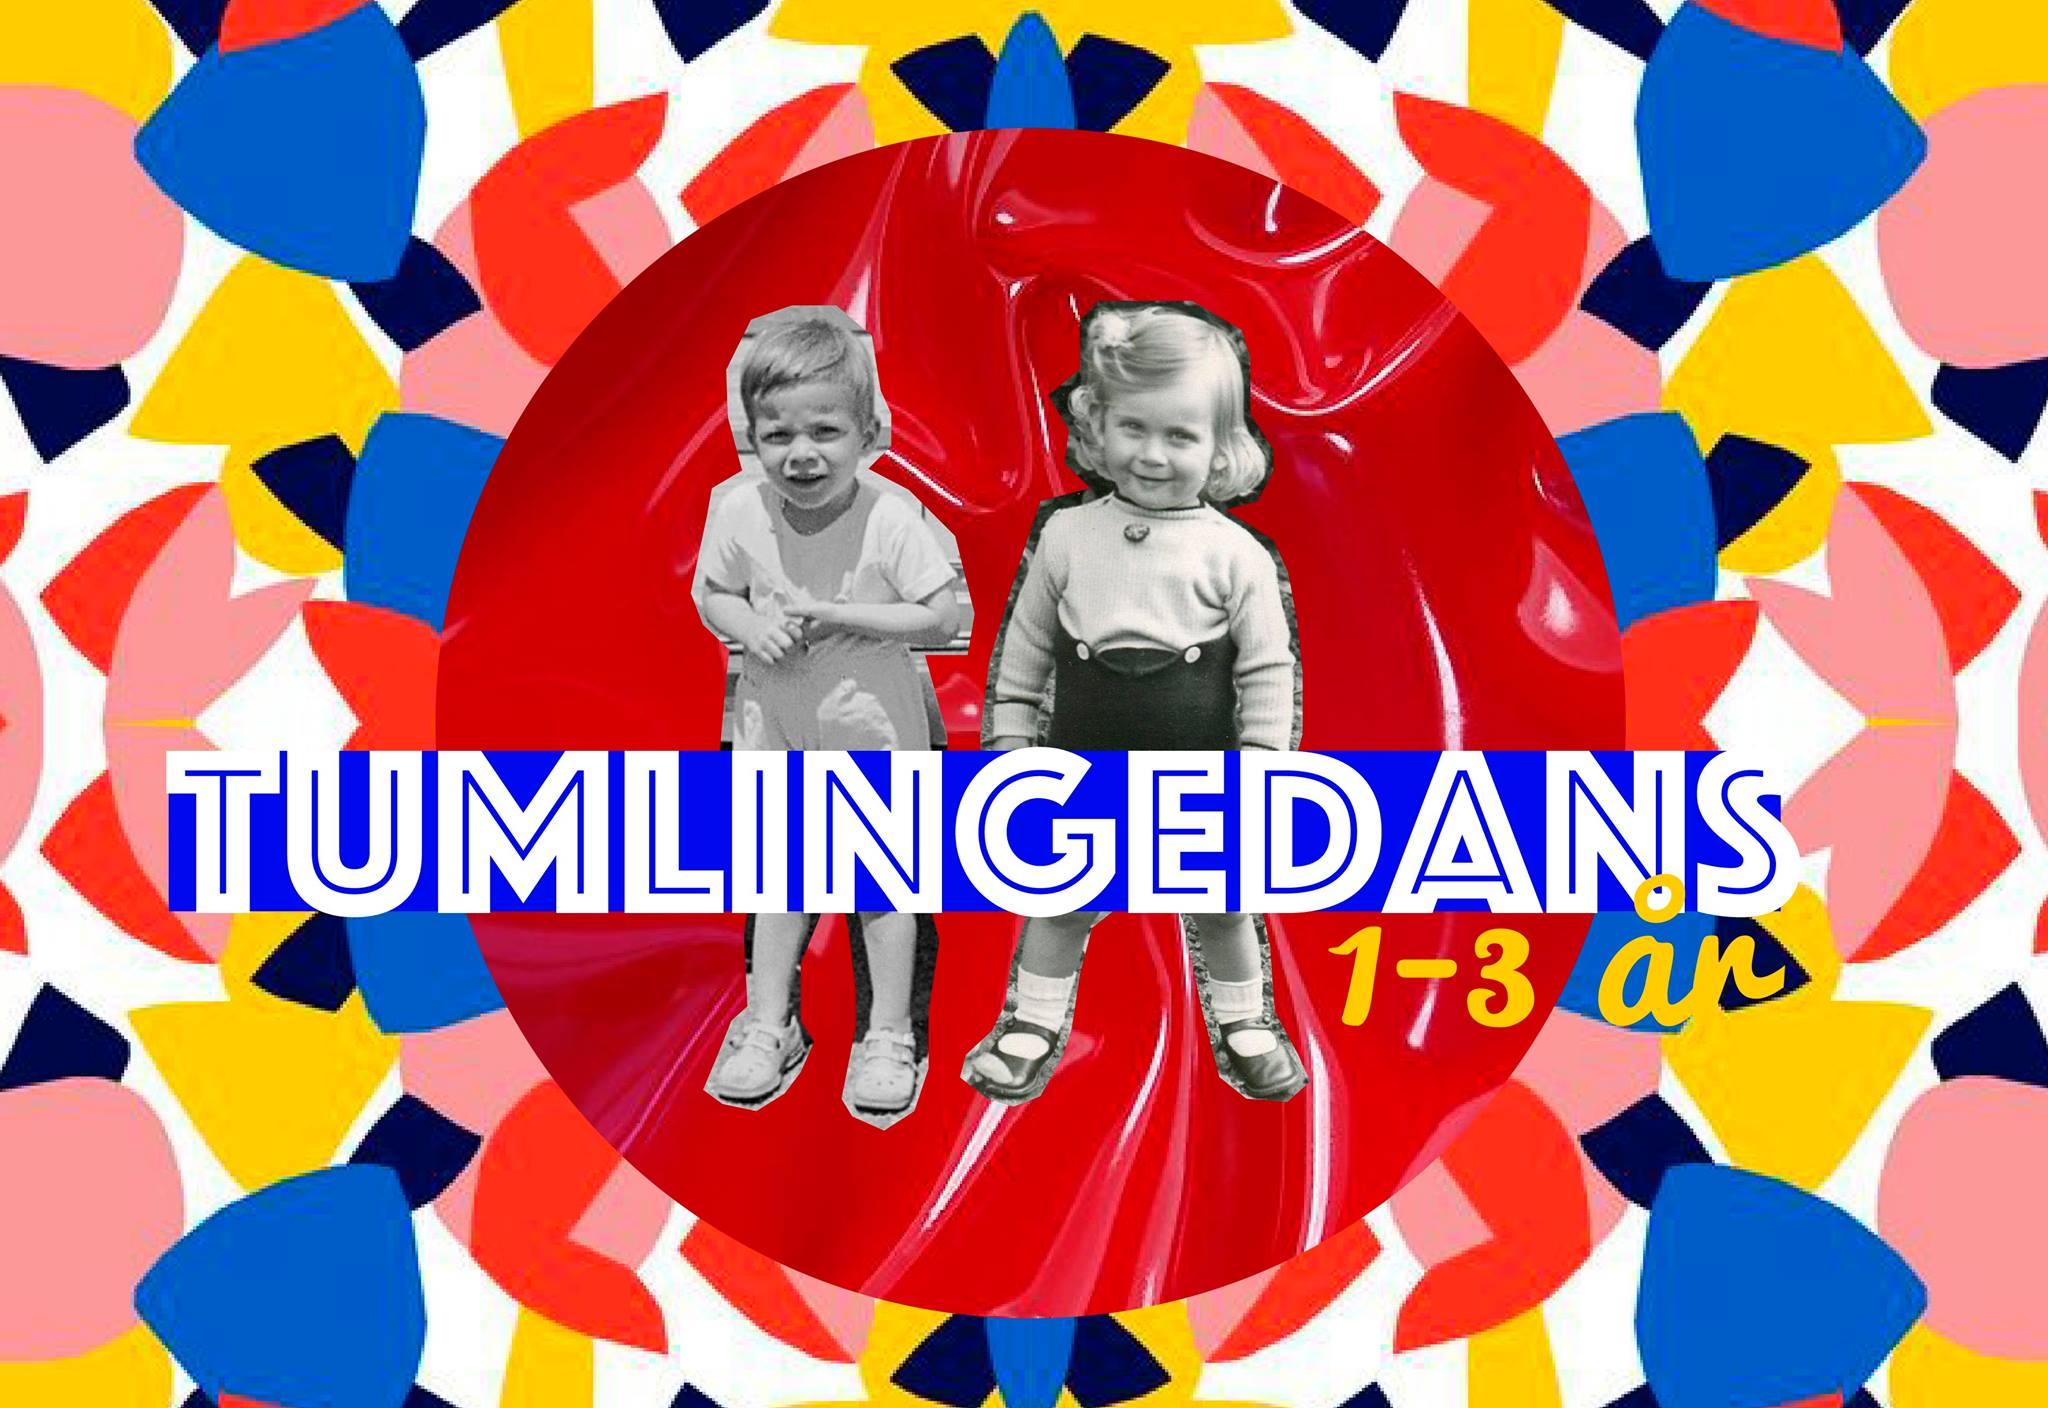 9c4dcb756d7 Fra 13:15 til 14:00Tumlingedans for de ca 1-3 årige, og deres mor eller  far. Hver torsdag kl. 13.15.